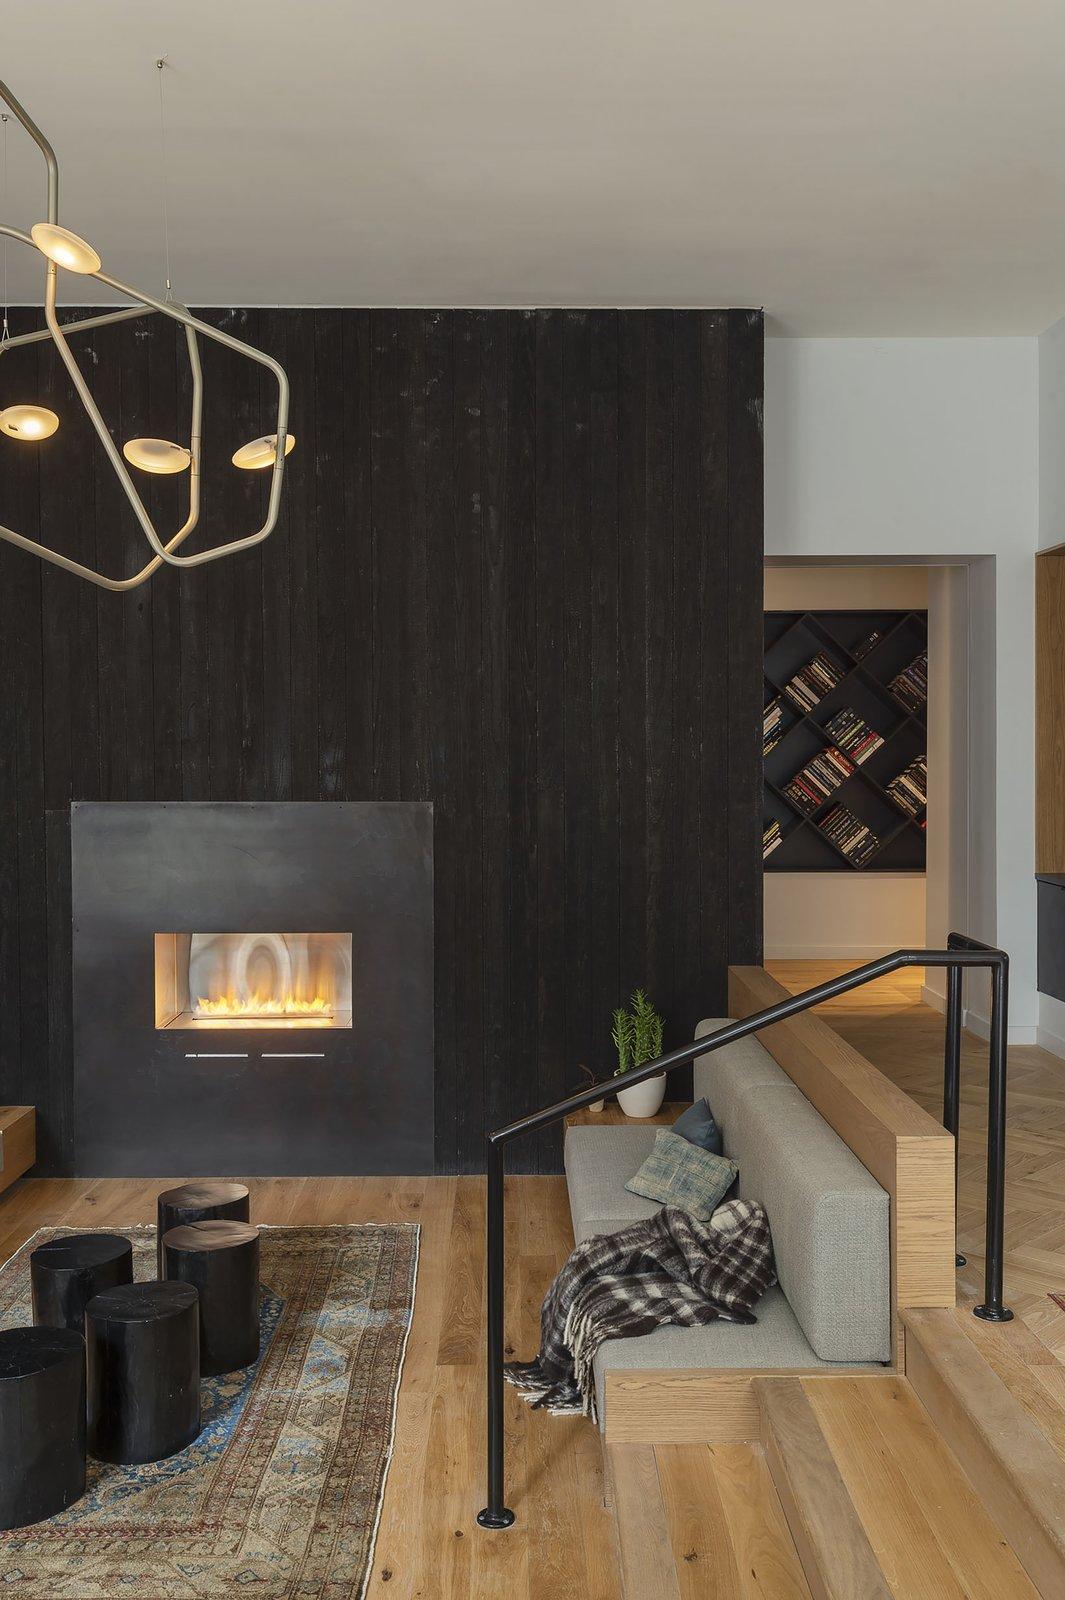 Living Room, Ribbon Fireplace, Bench, End Tables, Medium Hardwood Floor, Gas Burning Fireplace, Pendant Lighting, Light Hardwood Floor, and Rug Floor  ROOST Apartment Hotel